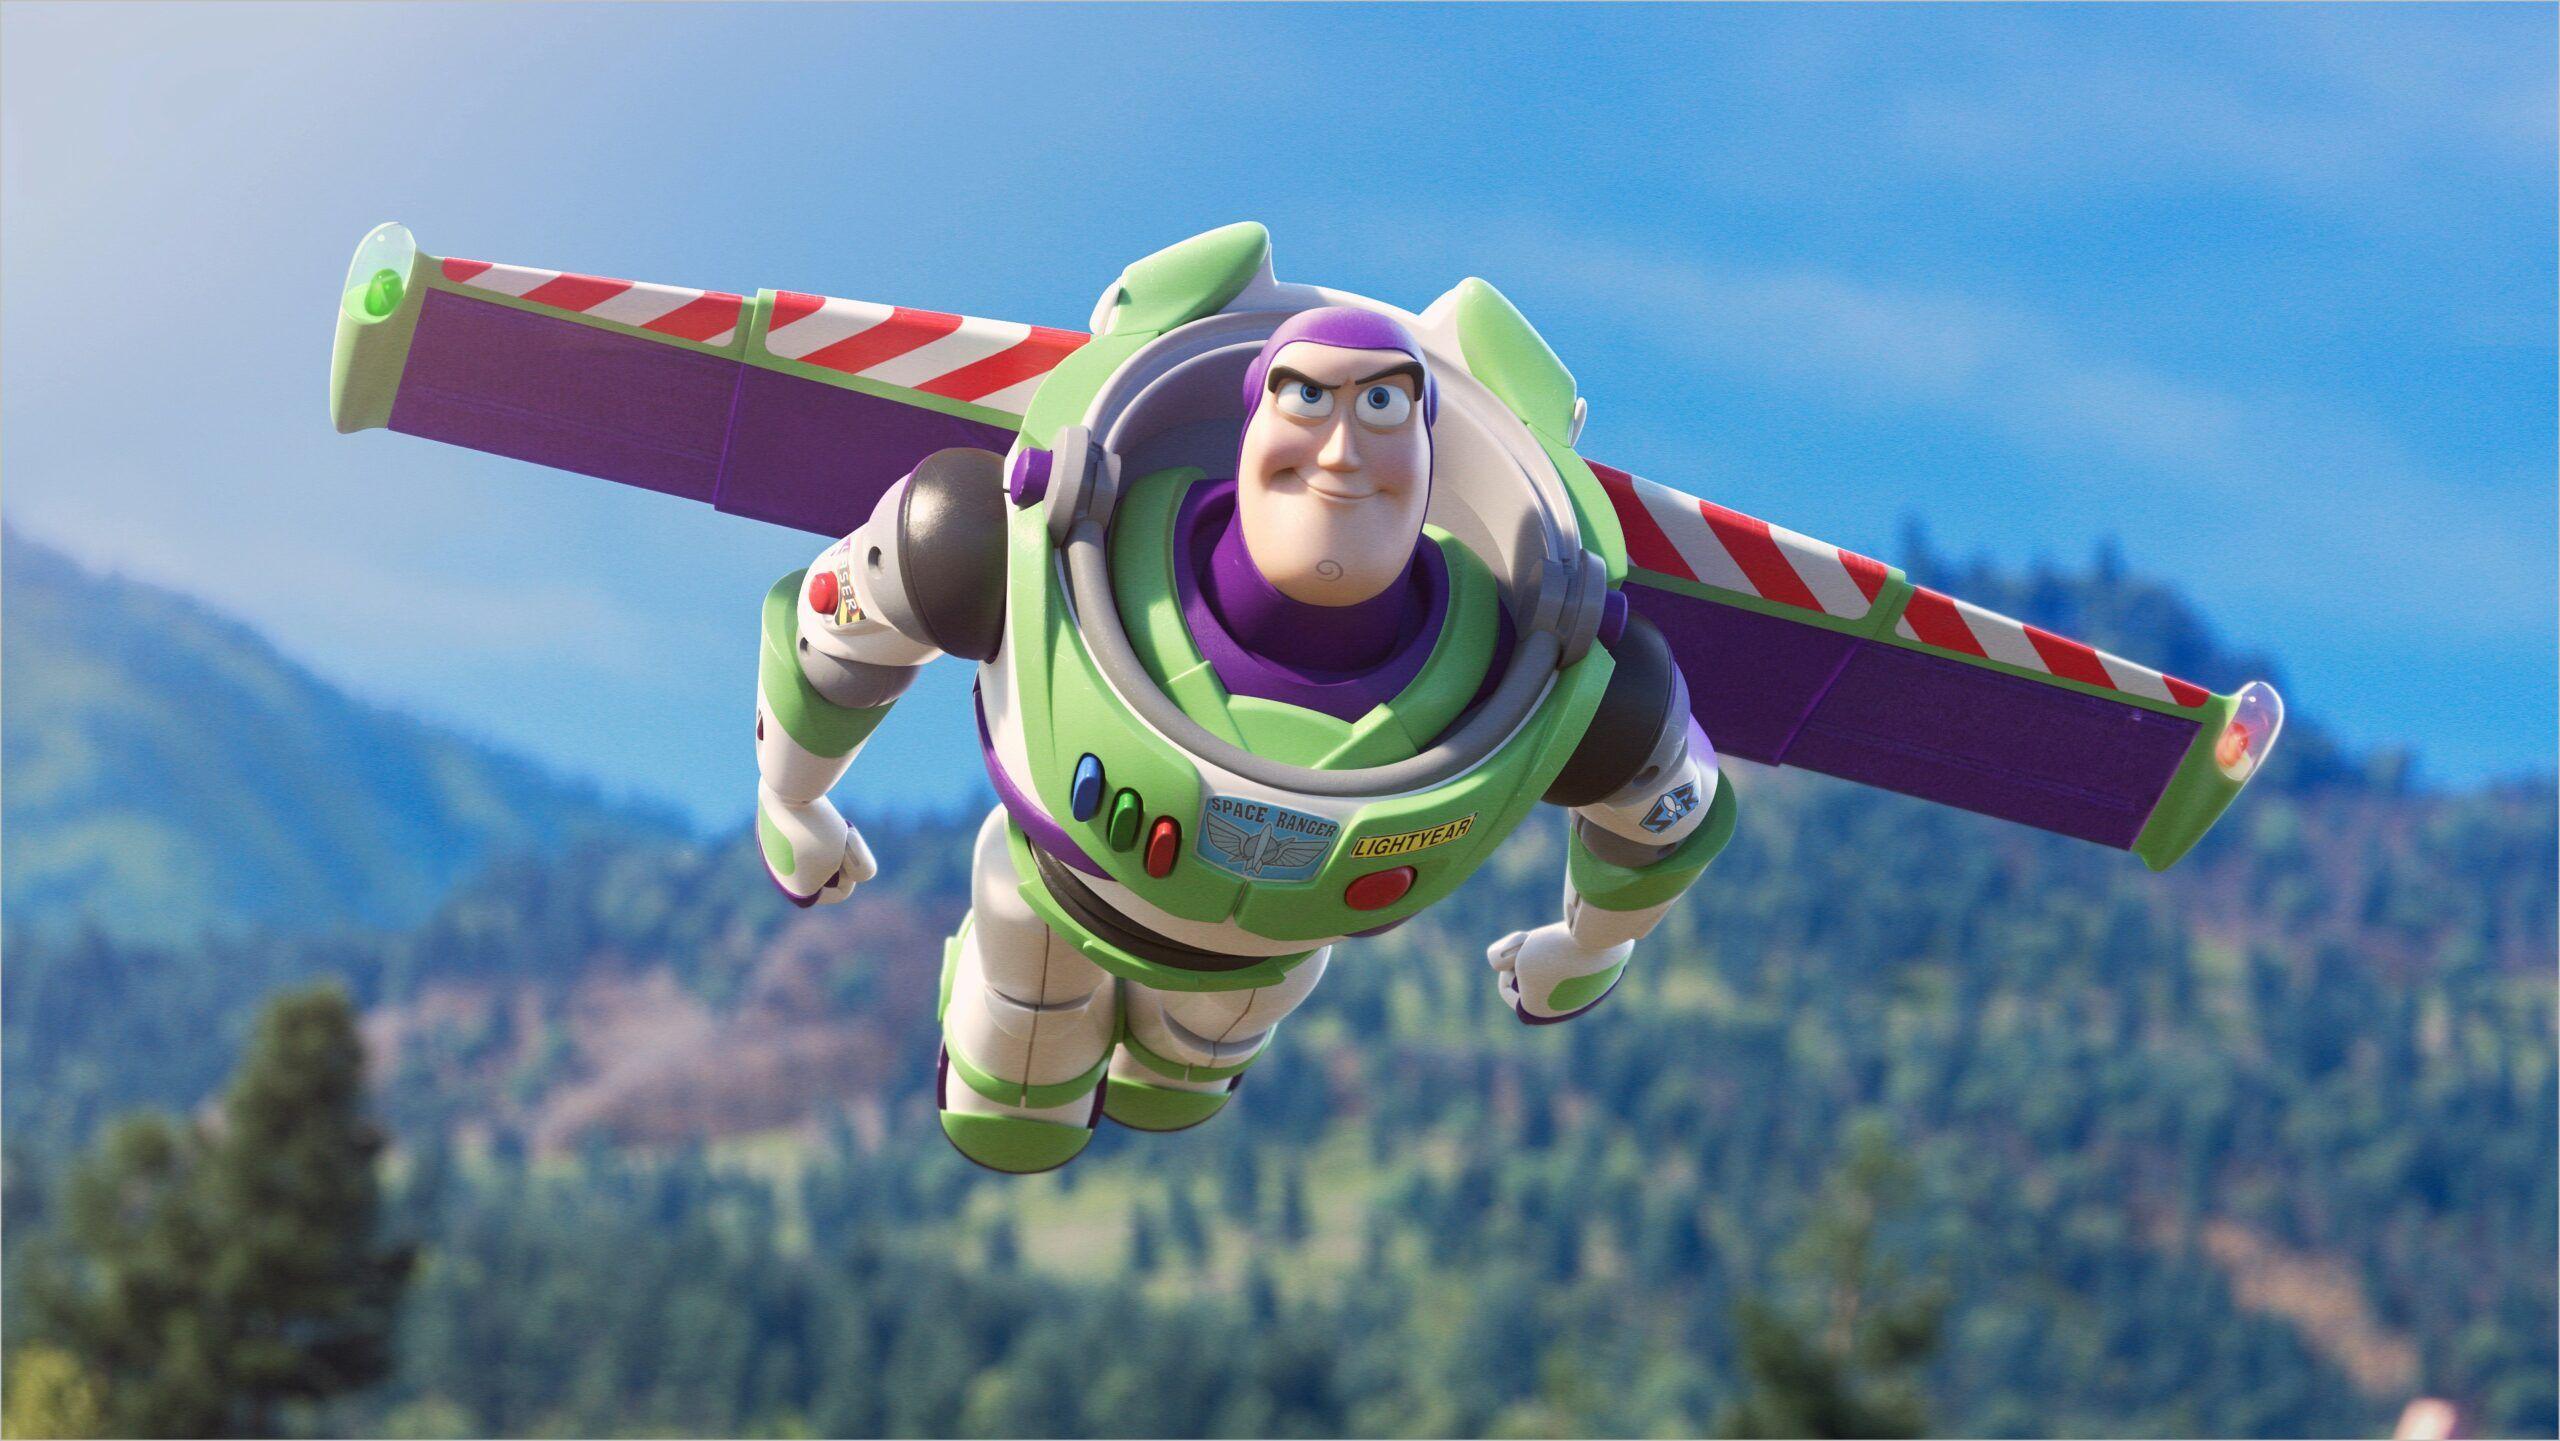 Buzz Lightyear Wallpaper 4k Desenho Toy Story Aniversario Toy Story Toy Story